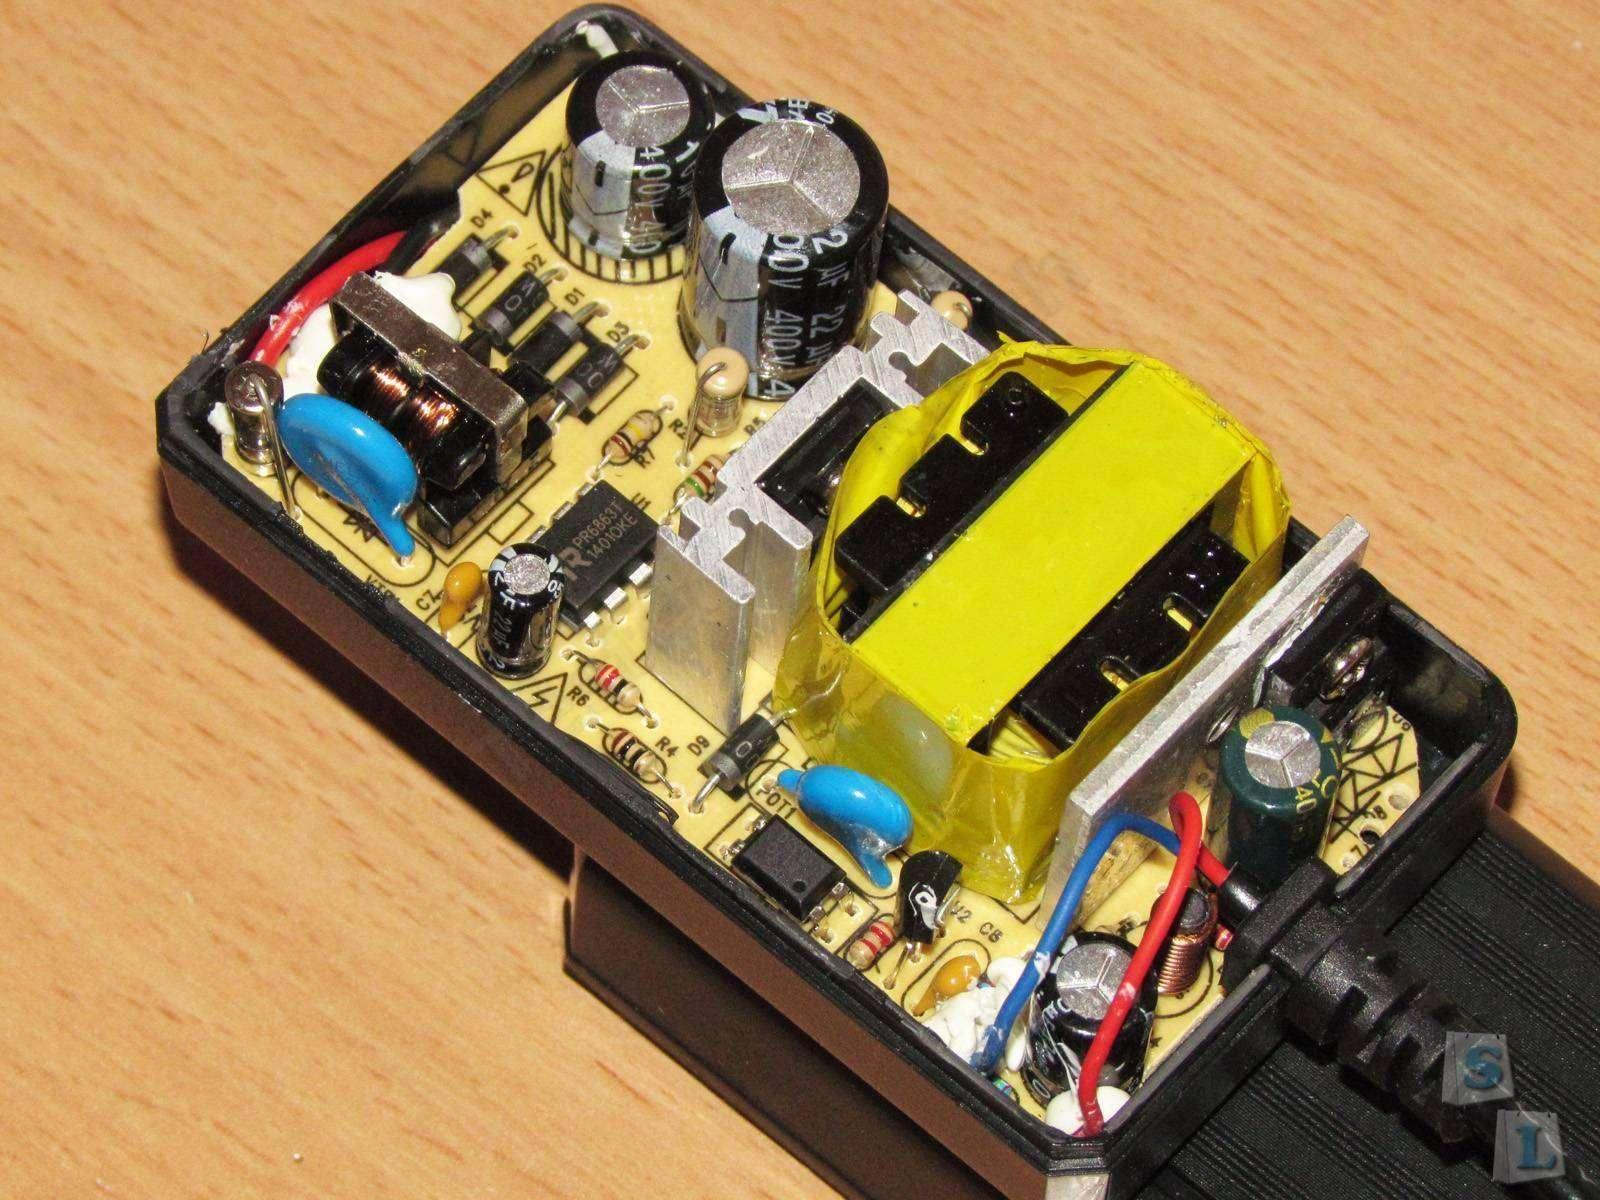 GearBest: FL-4H-LCD-D, или зарядное устройство от неизвестного производителя.